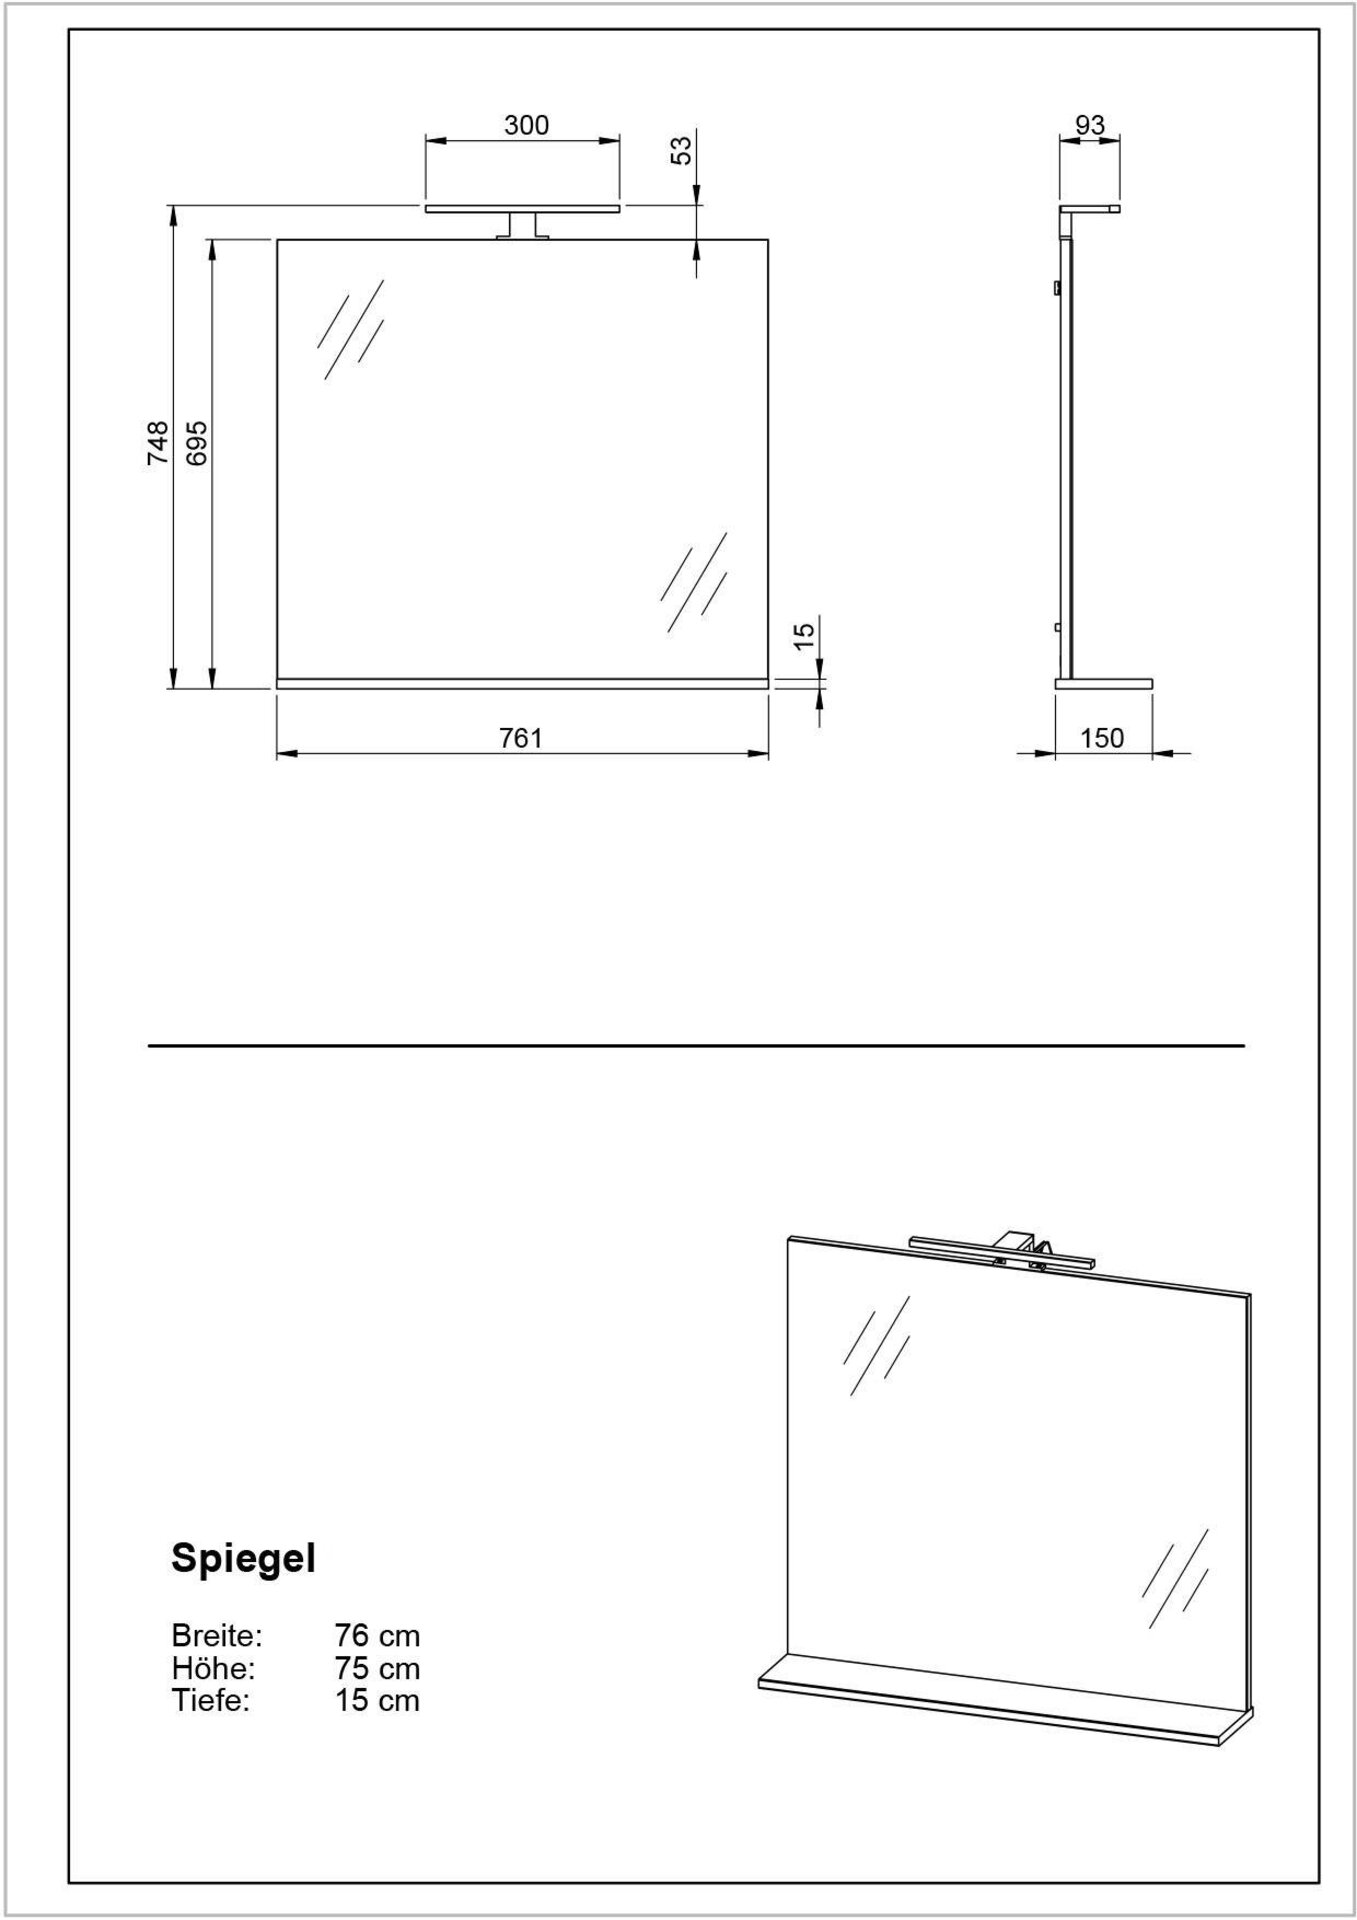 Spiegel Germania Holzwerkstoff grau 15 x 75 x 76 cm